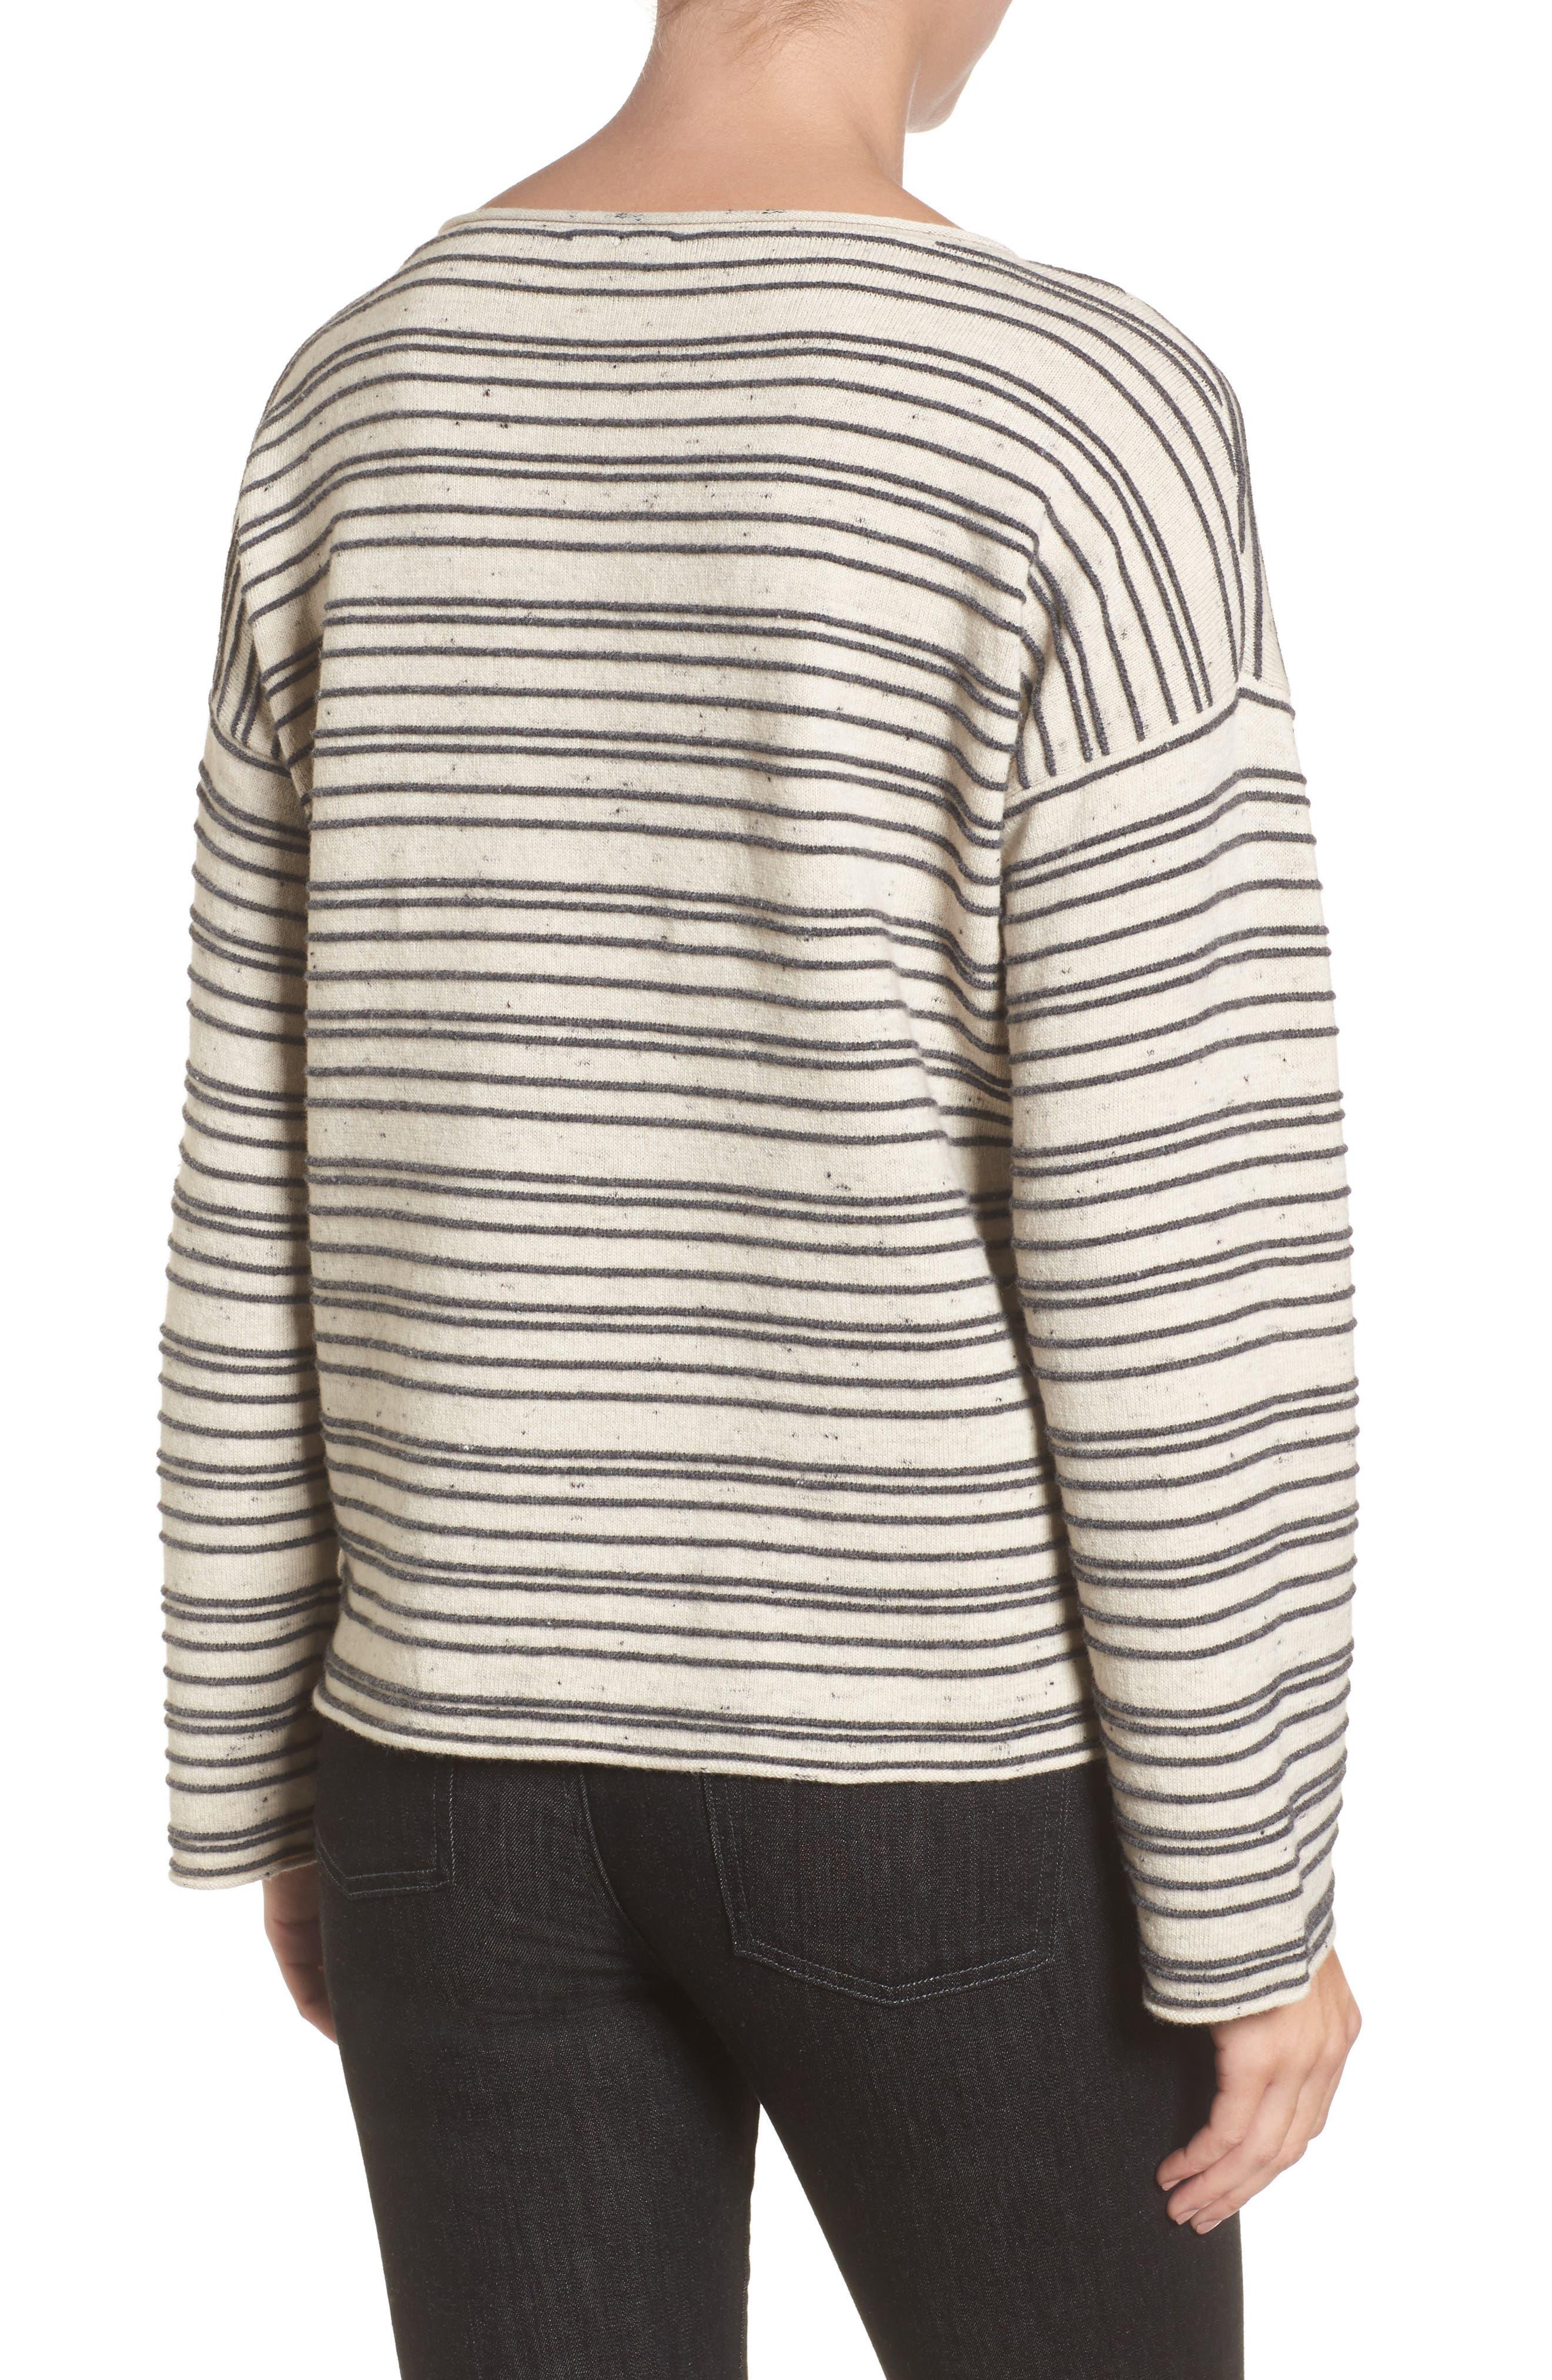 Stripe Organic Cotton Blend Sweater,                             Alternate thumbnail 2, color,                             264